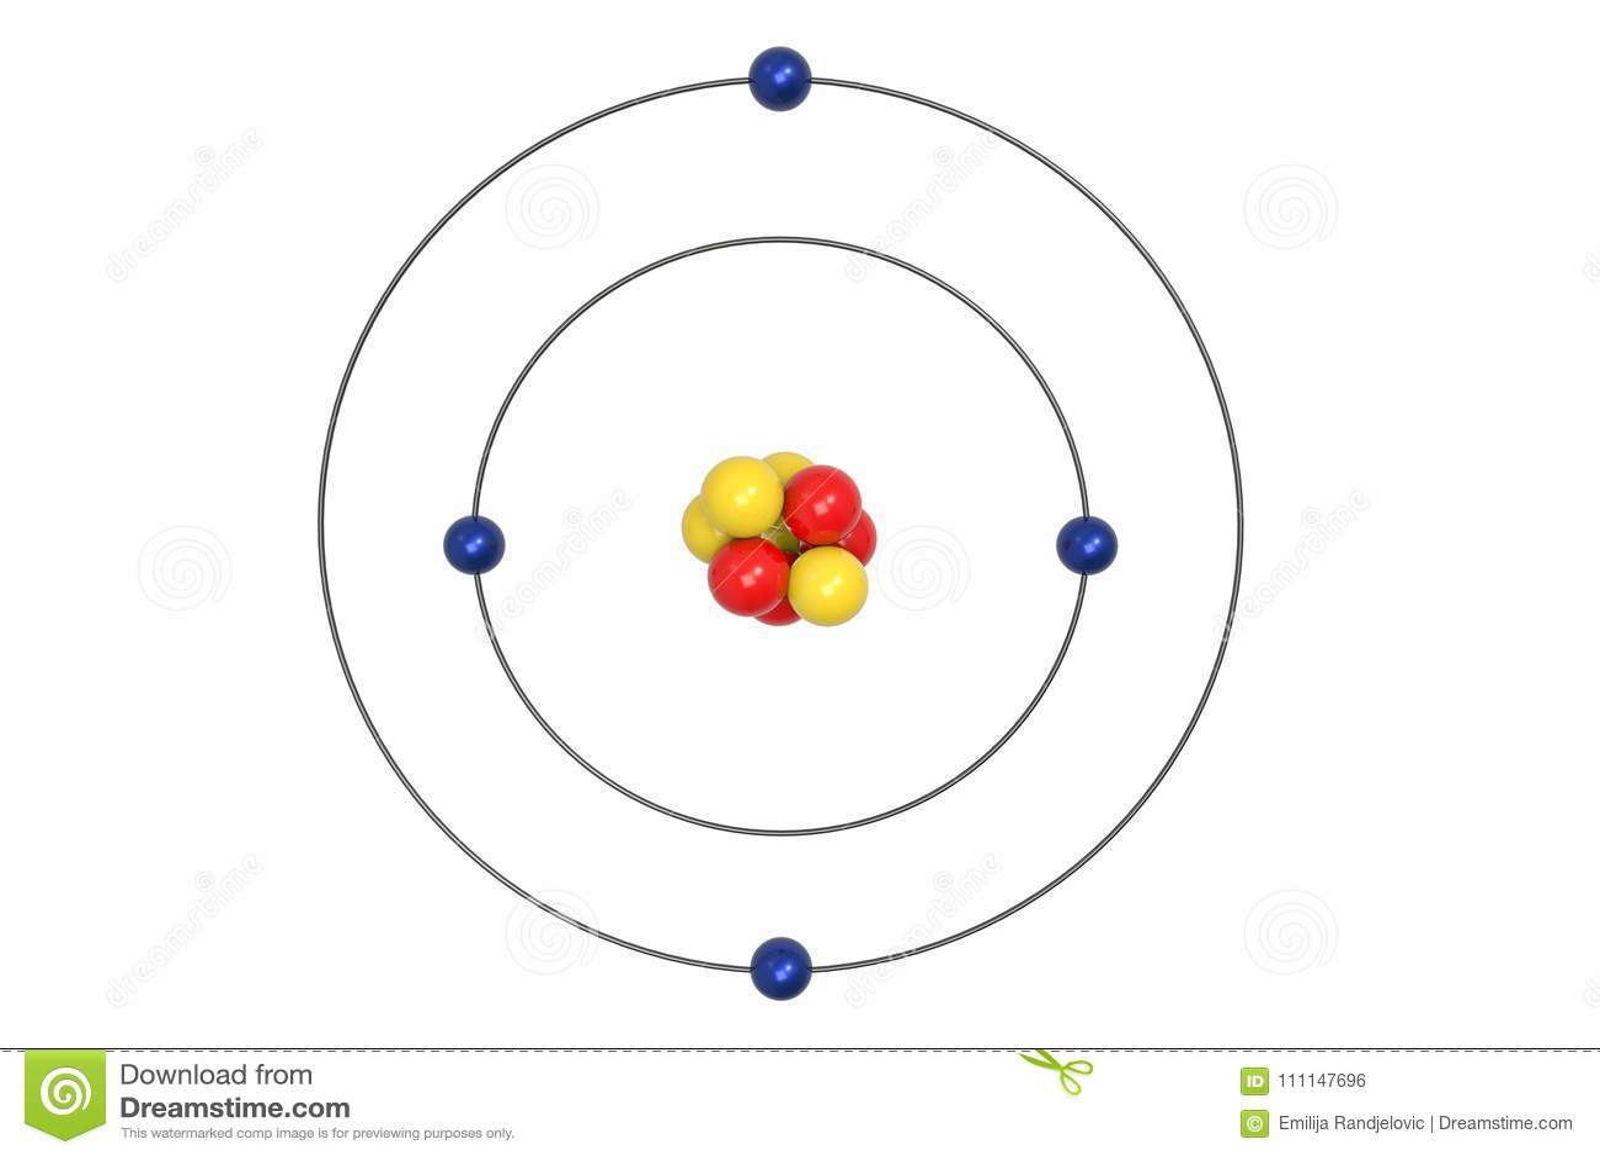 Beryllium Atom Bohr Modell Mit Proton Neutron Und